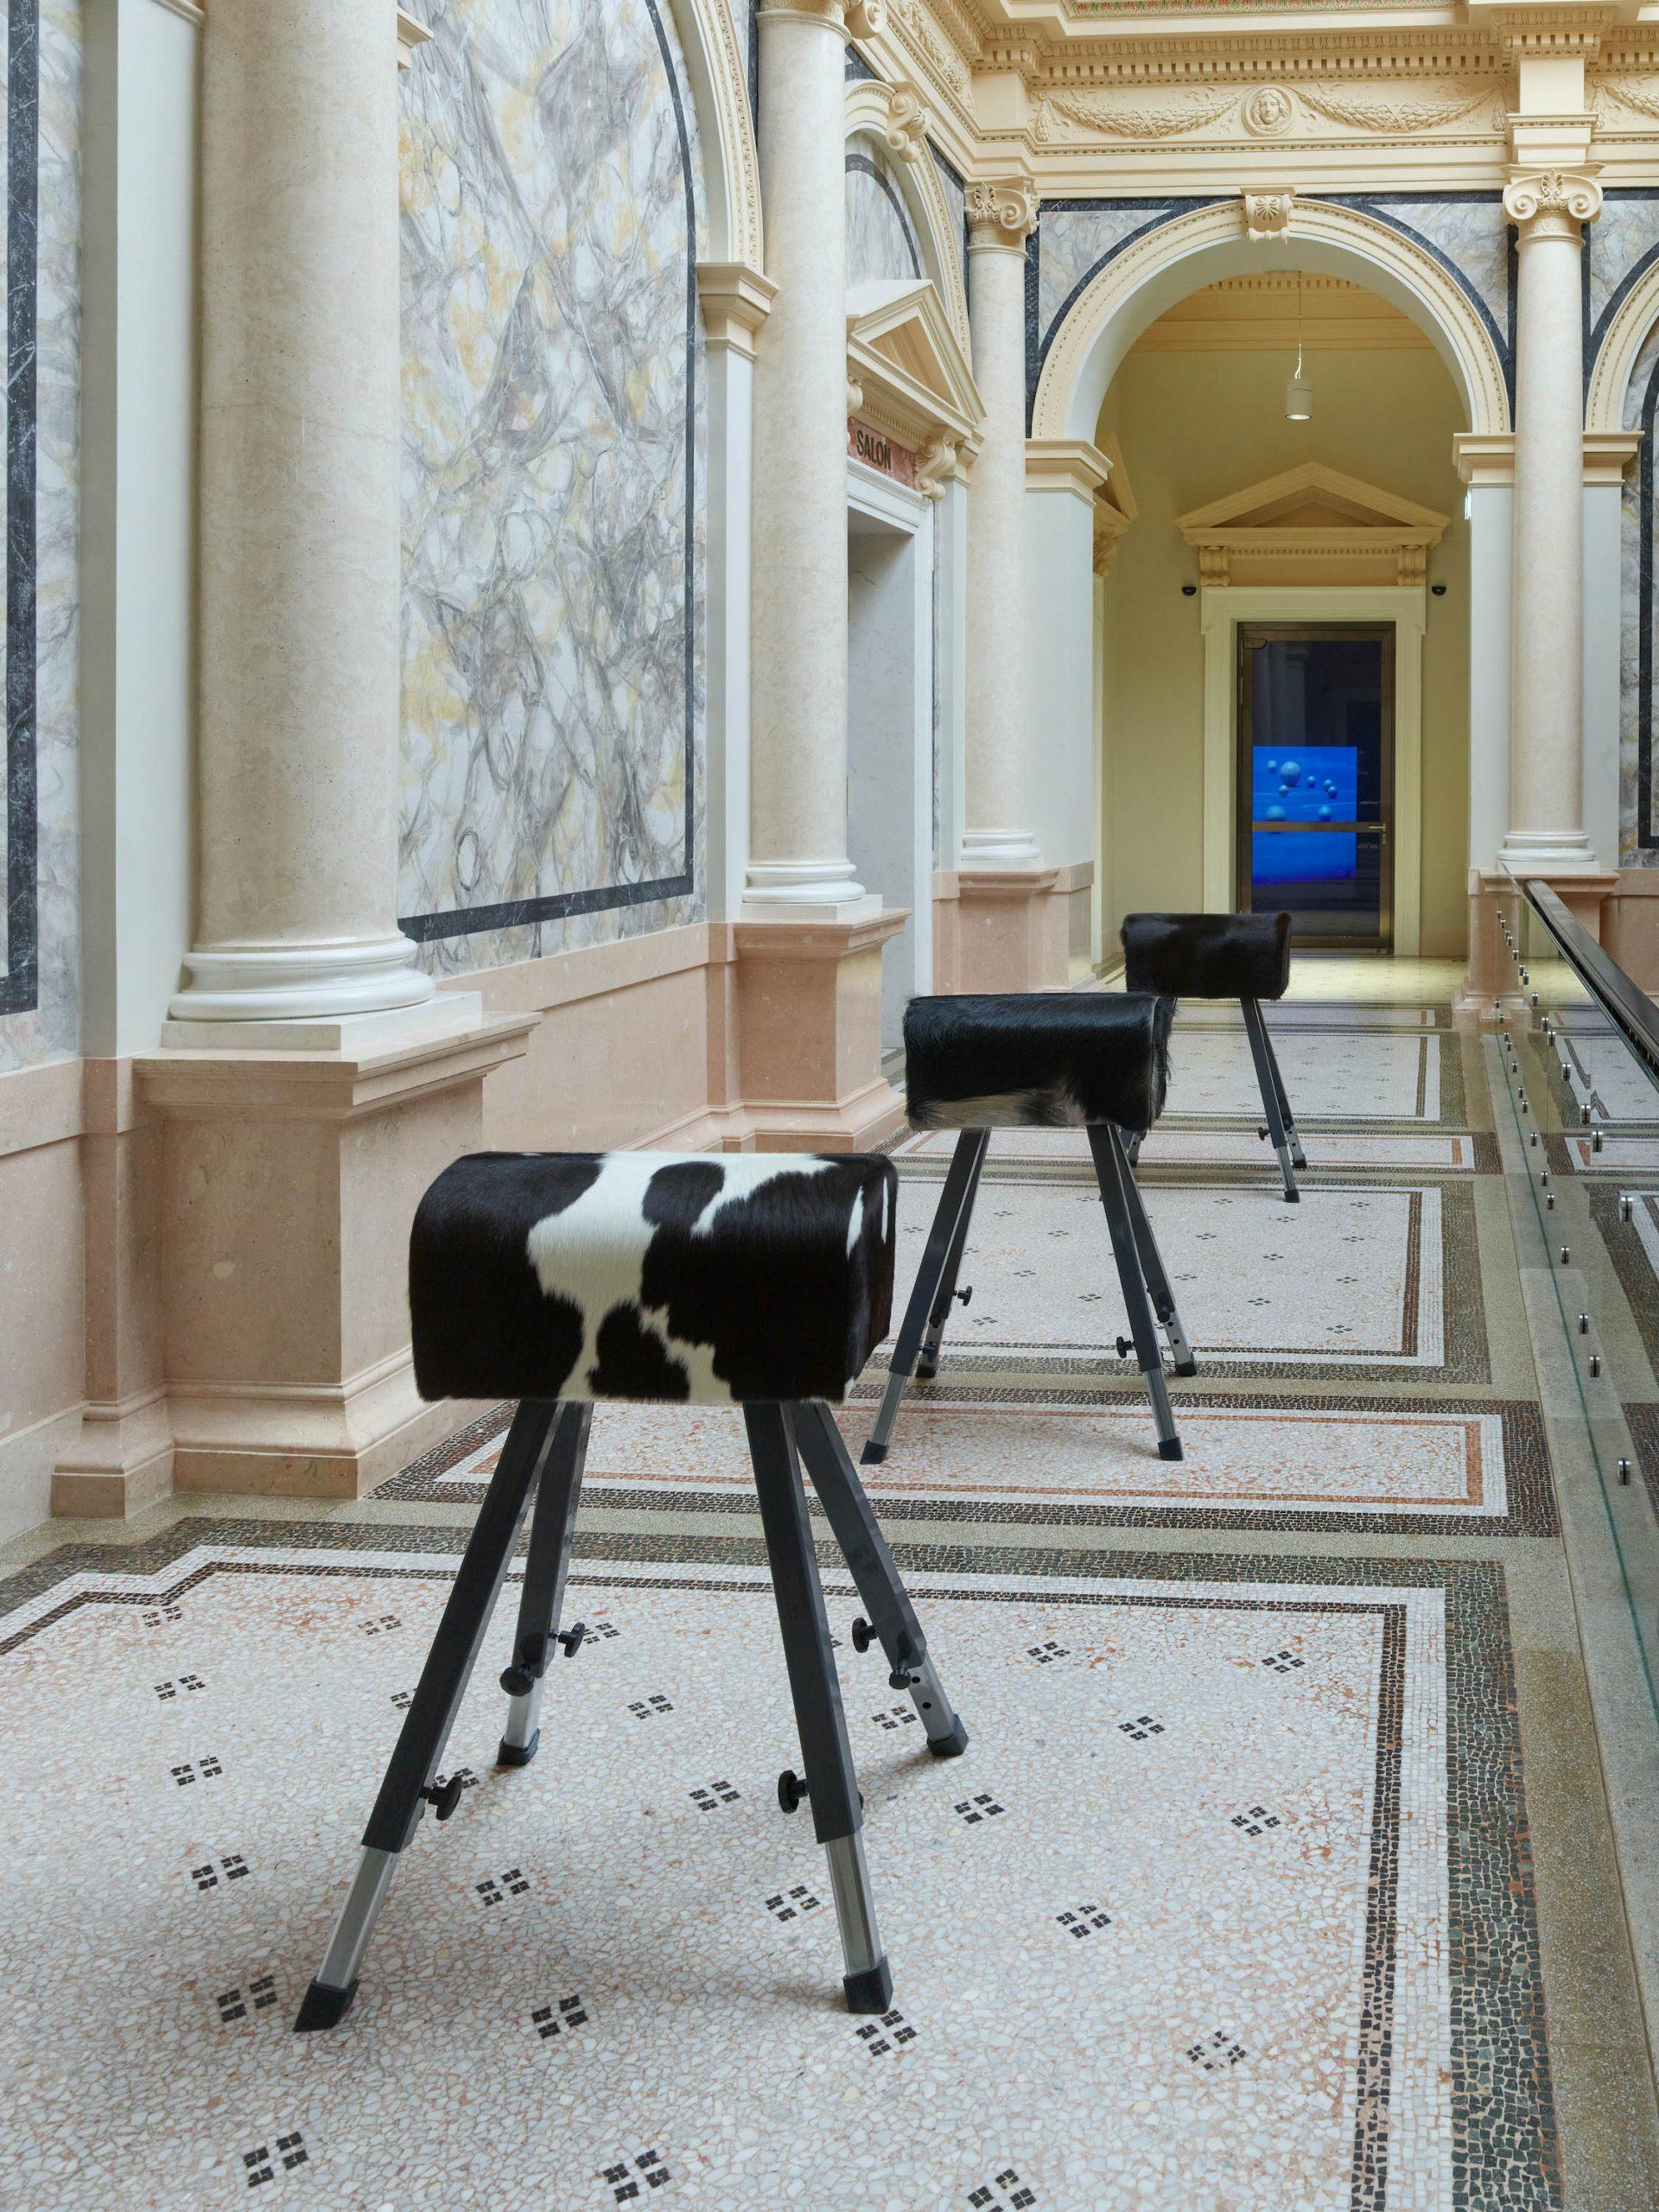 Maja Smrekar 96% of all Mammals on Earth Are Humans and Livestock, 2020 Fell bezogene Turnböcke Installationsansicht Foto: Pascal Petignat